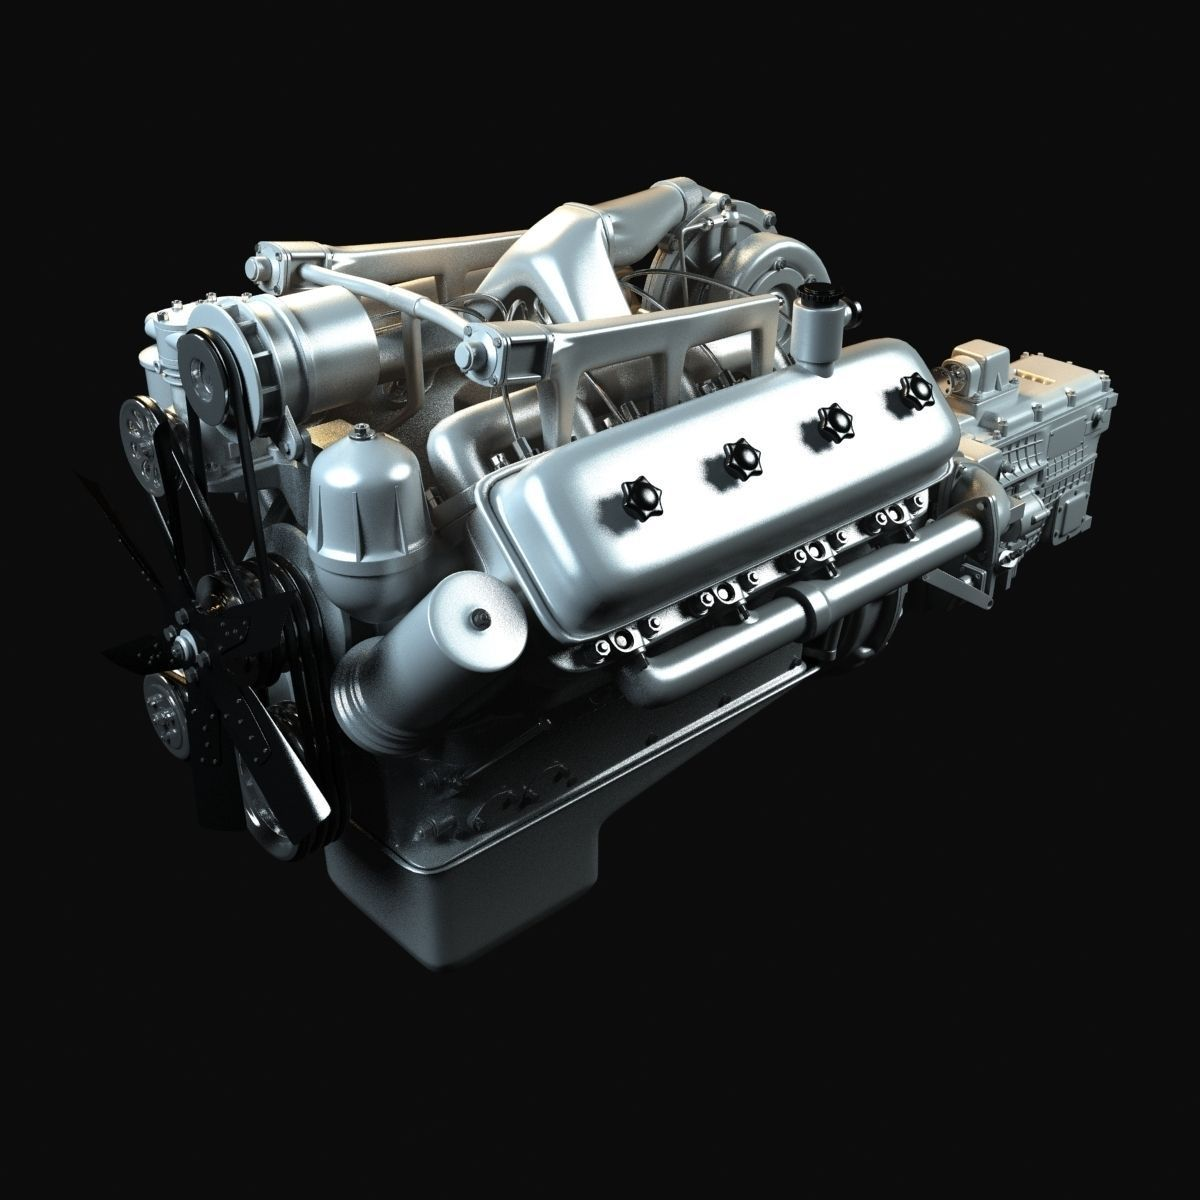 Kraz Engine With Gearbox